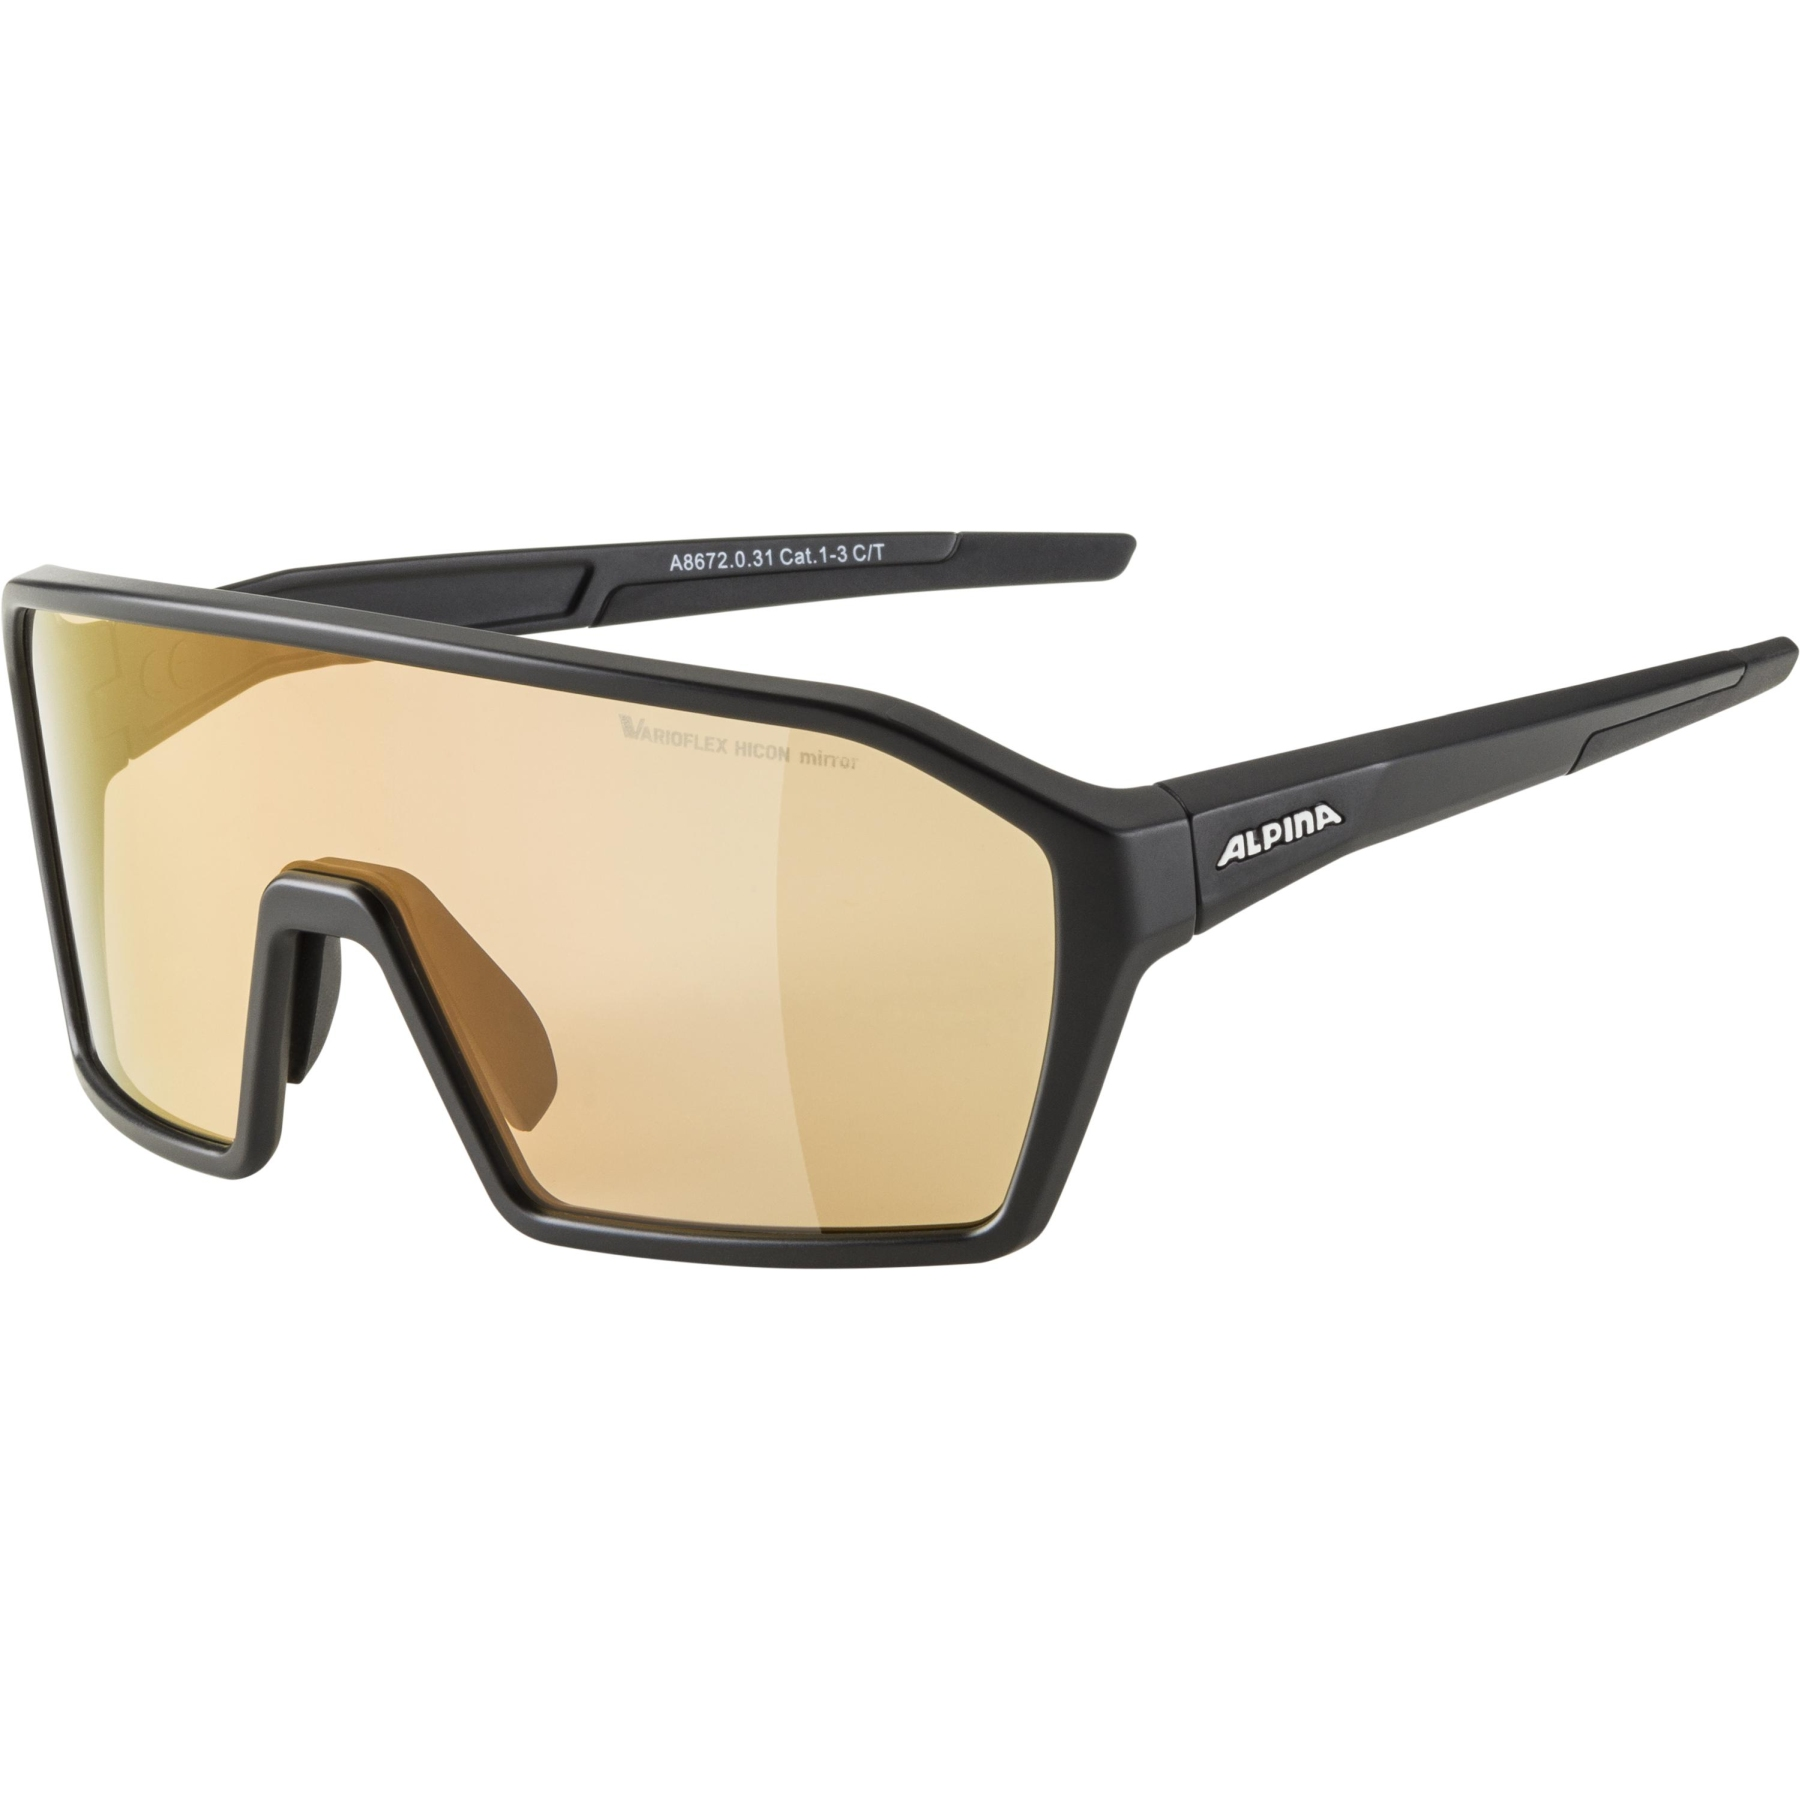 Alpina Ram HVLM+ Glasses - black matt / Hicon Varioflex red mirror